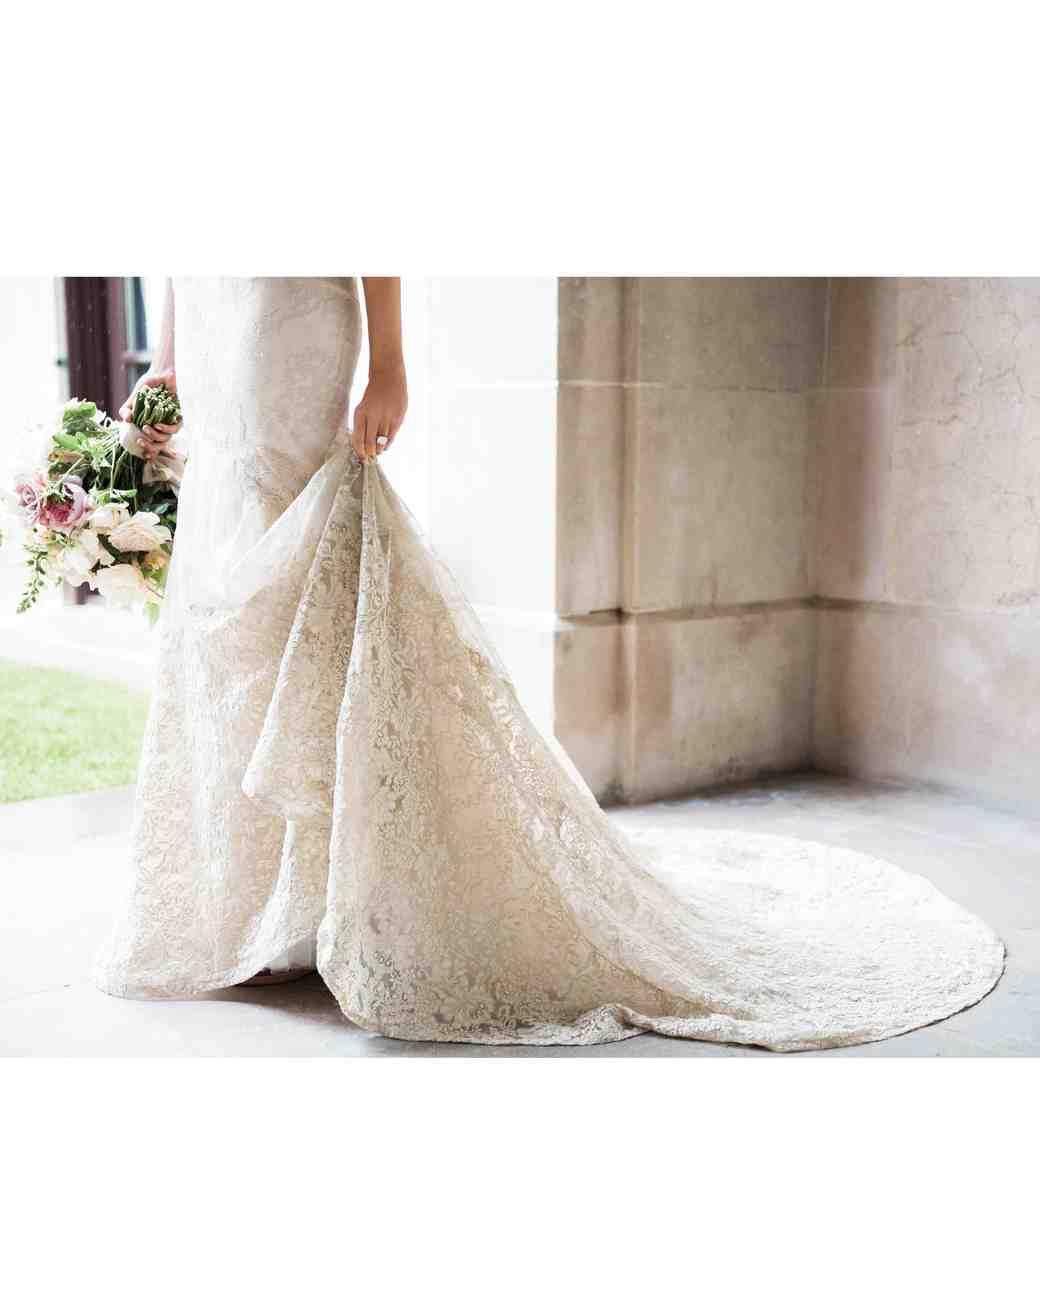 rebecca-david-wedding-new-york-bride-dress-details-141-d112241.jpg